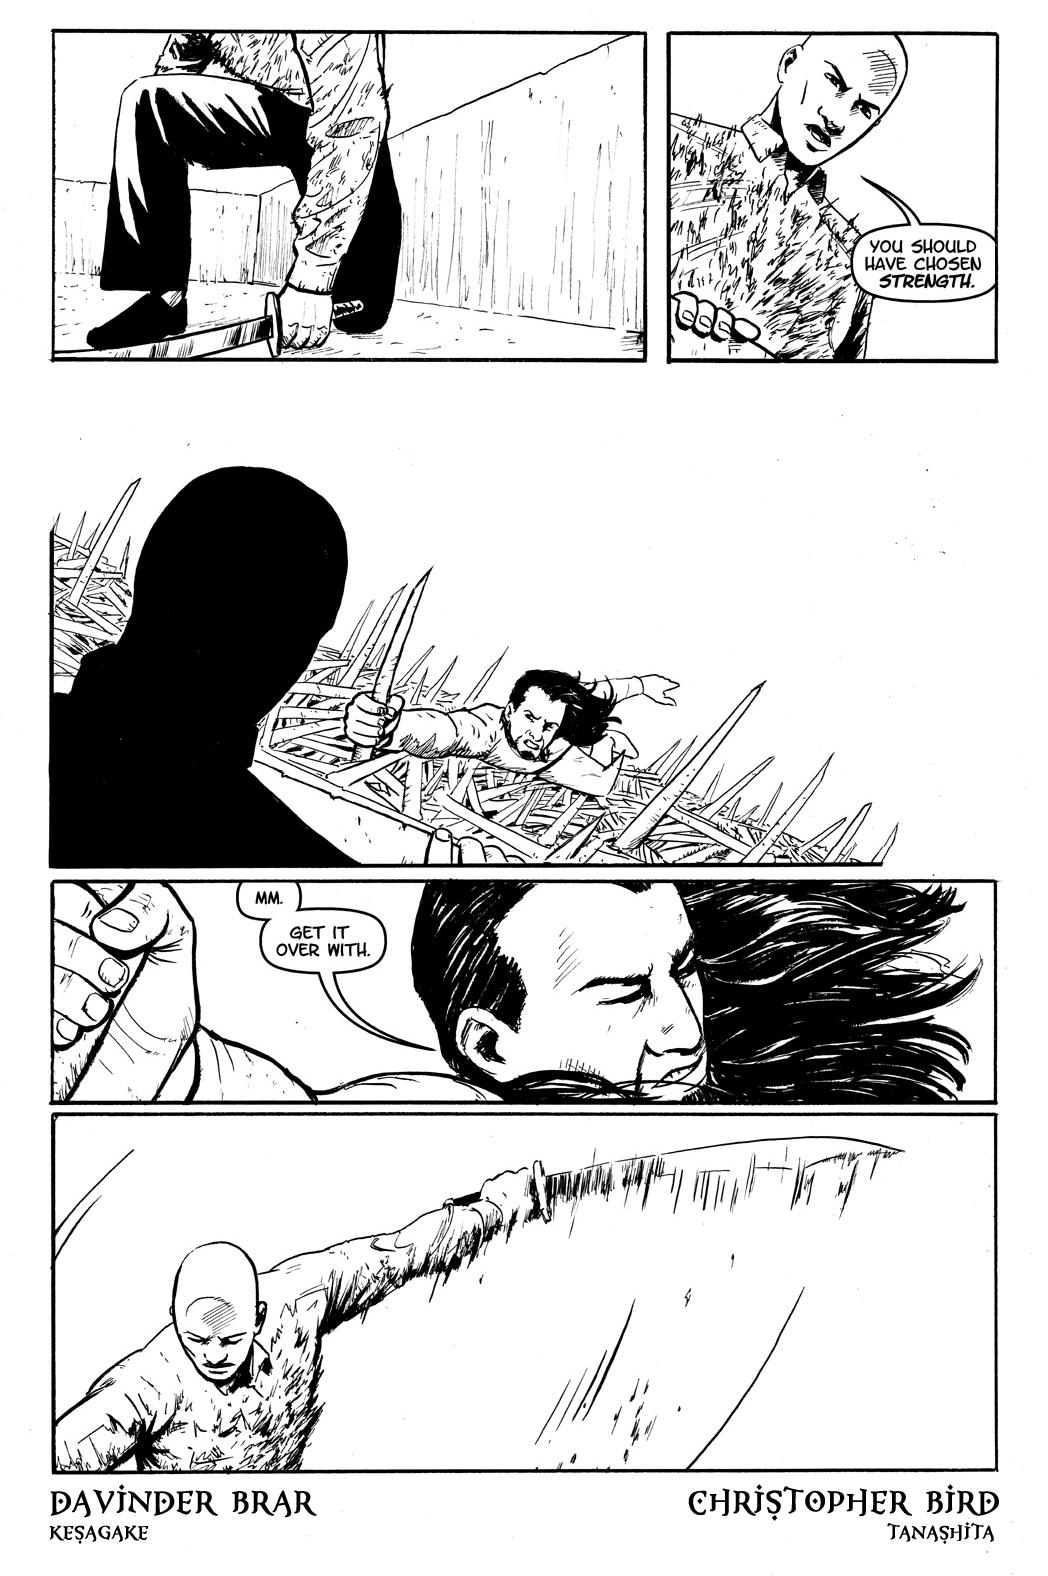 Book Eight, Page Twenty-Eight